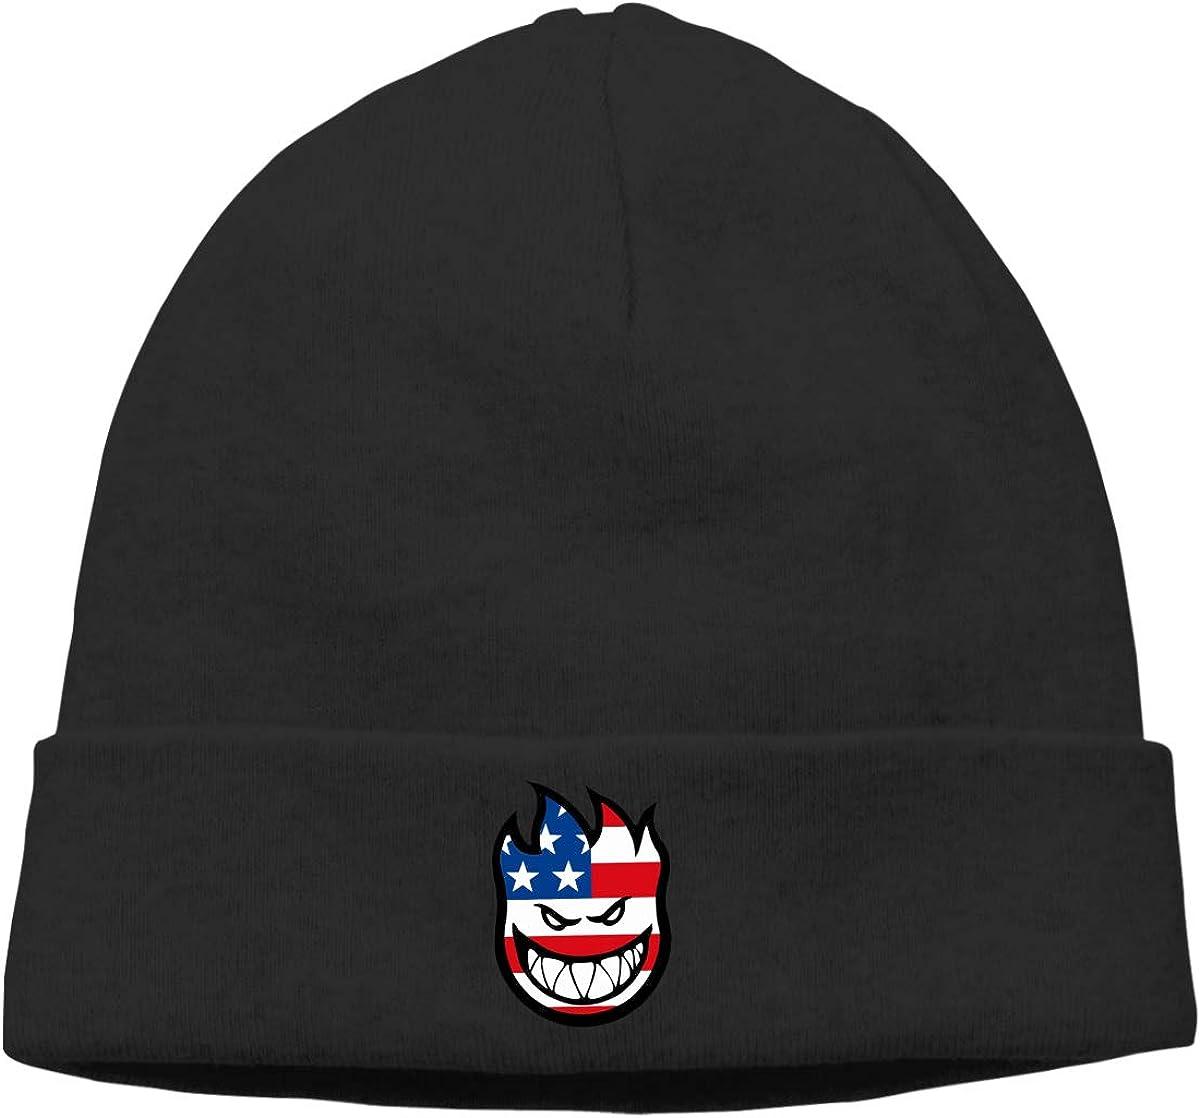 Miss Yoki Spitfire Flaghead Knit Skull Caps Thick Soft Warm Winter Hats for Women Men Cotton Hat Black